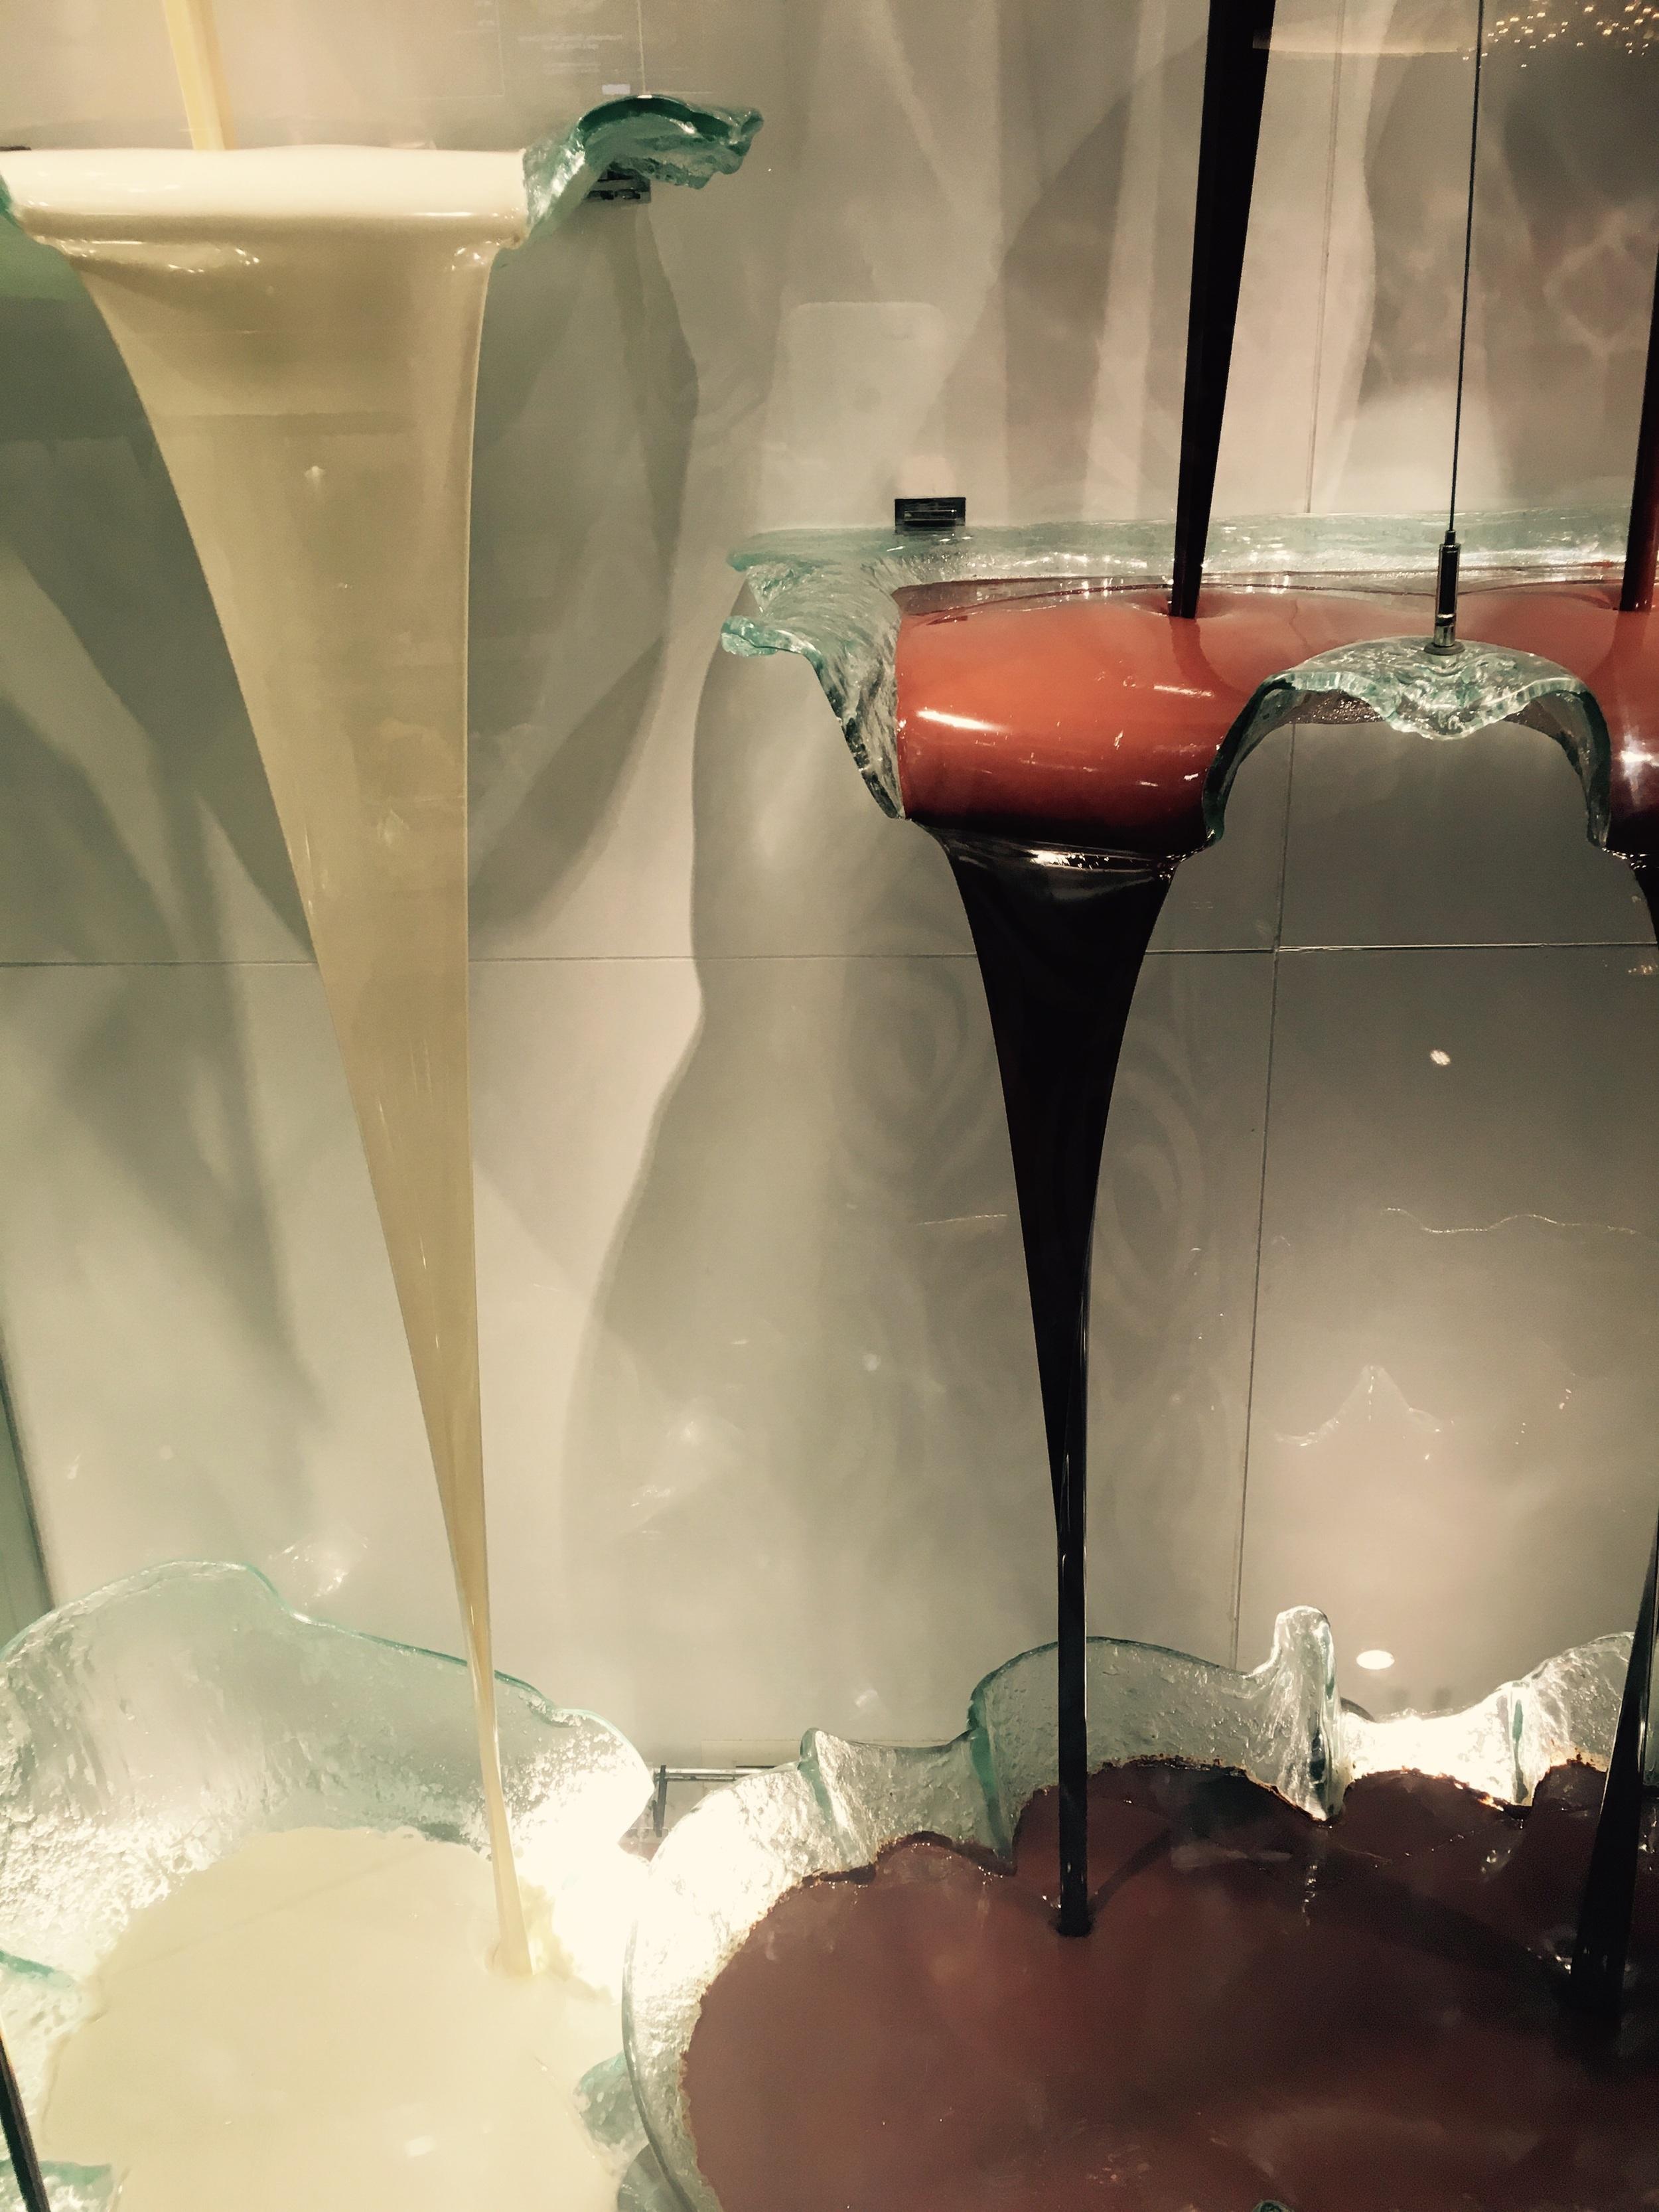 White, milk and dark chocolate collide!